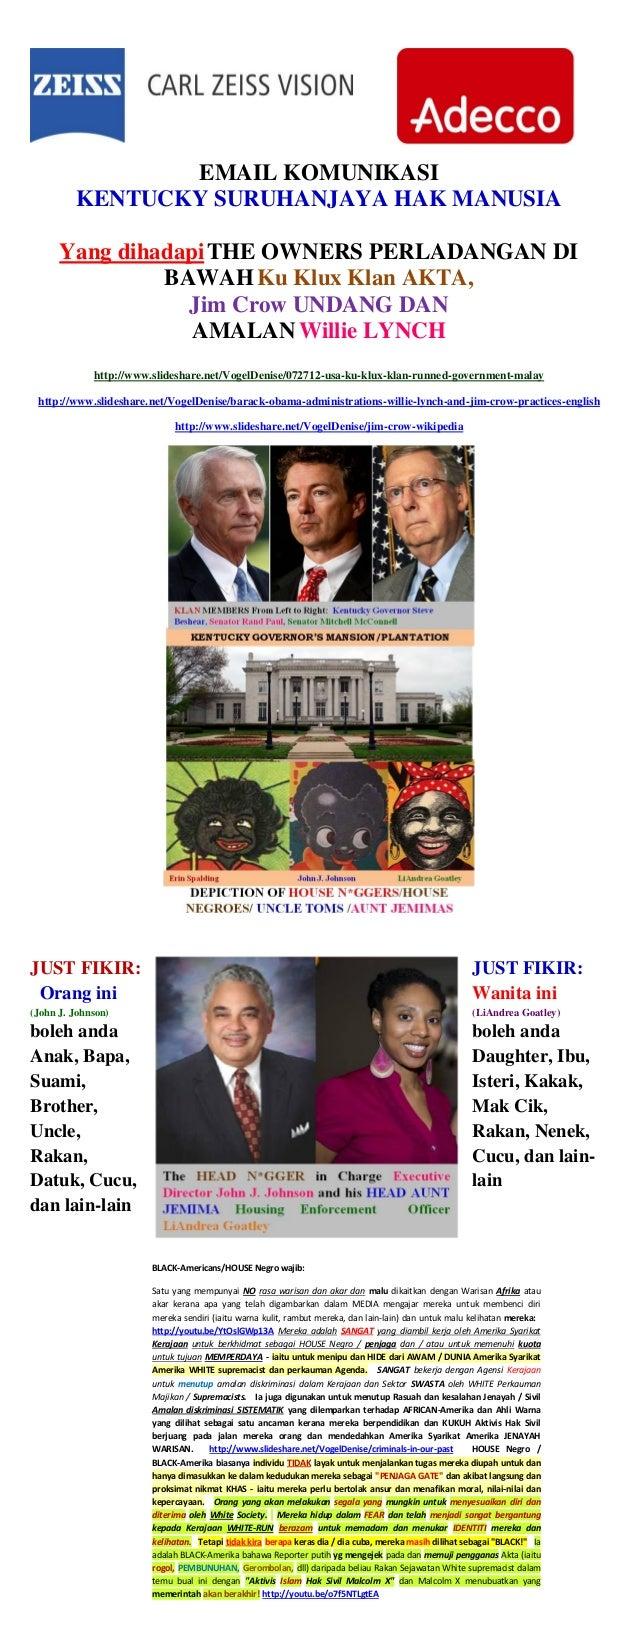 EMAIL KOMUNIKASI KENTUCKY SURUHANJAYA HAK MANUSIA Yang dihadapiTHE OWNERS PERLADANGAN DI BAWAHKu Klux Klan AKTA, Jim Crow ...